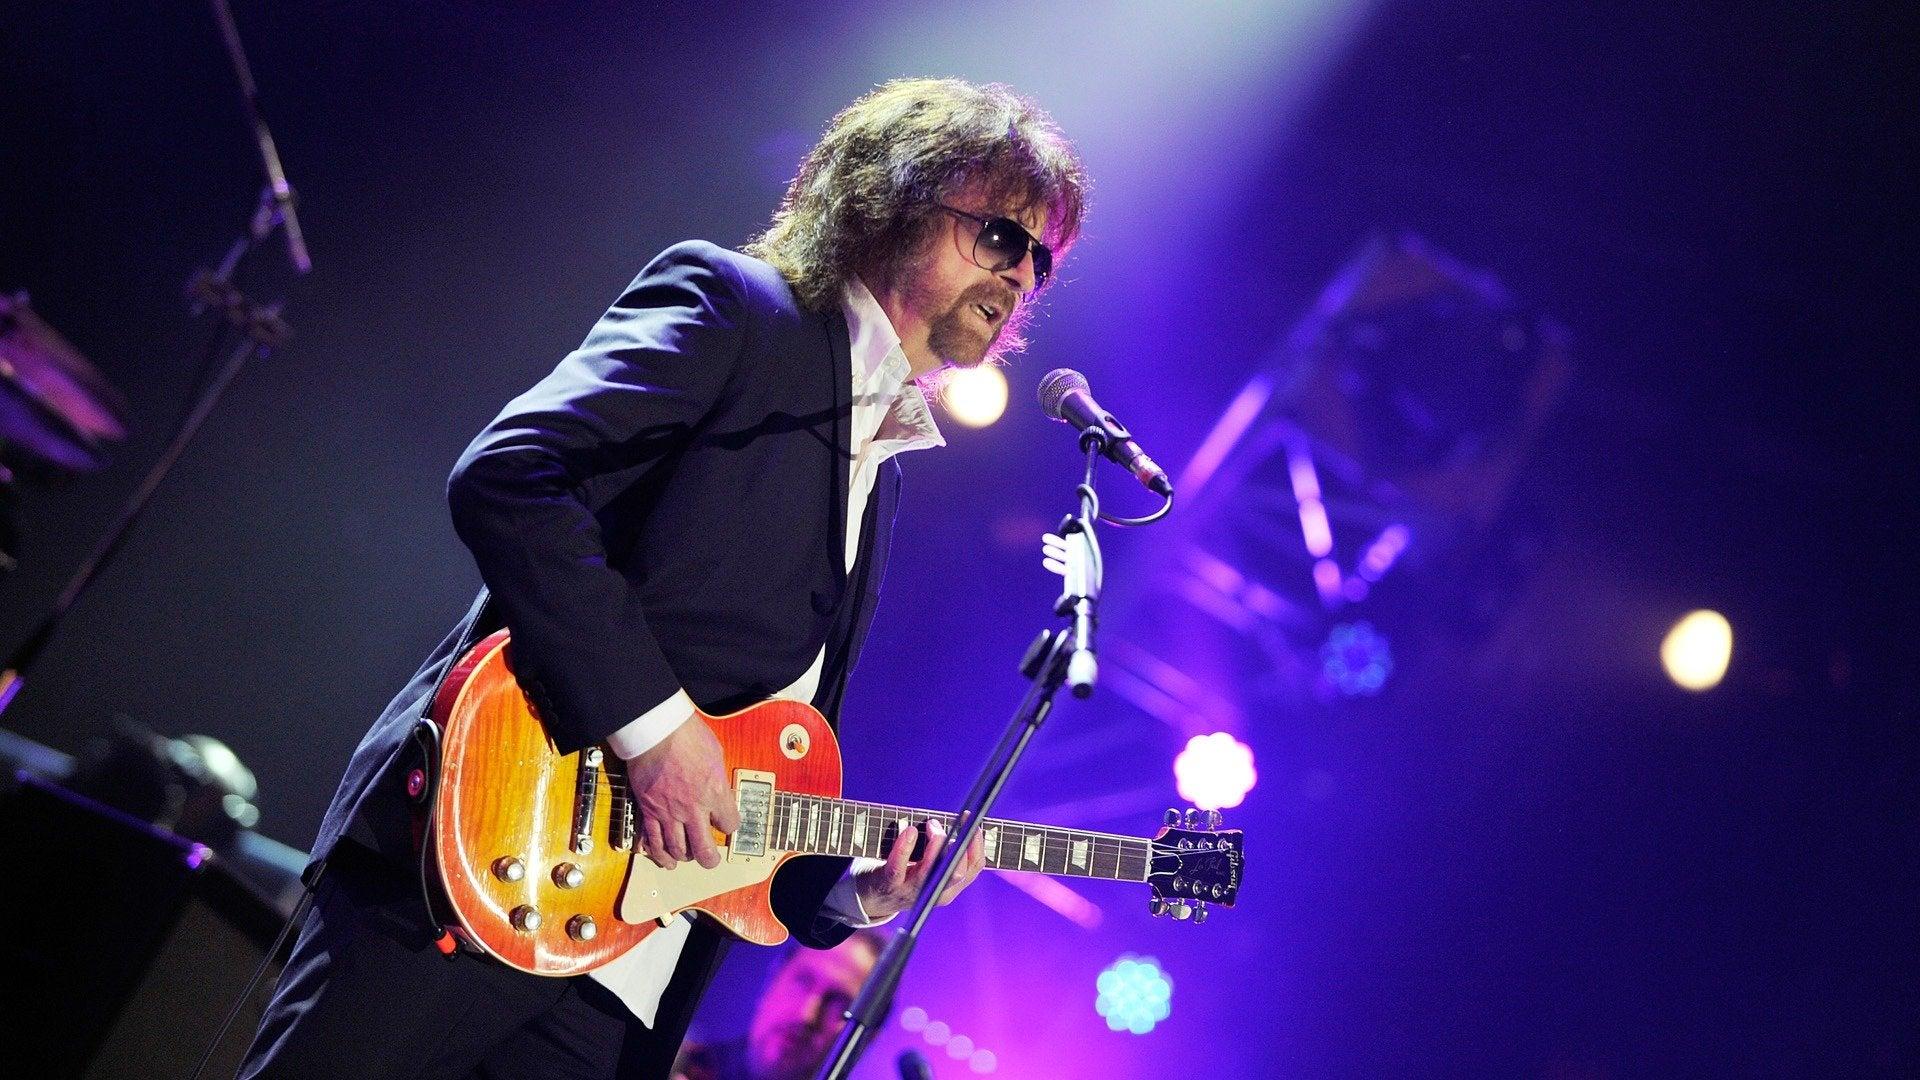 Jeff Lynne's ELO at Hyde Park